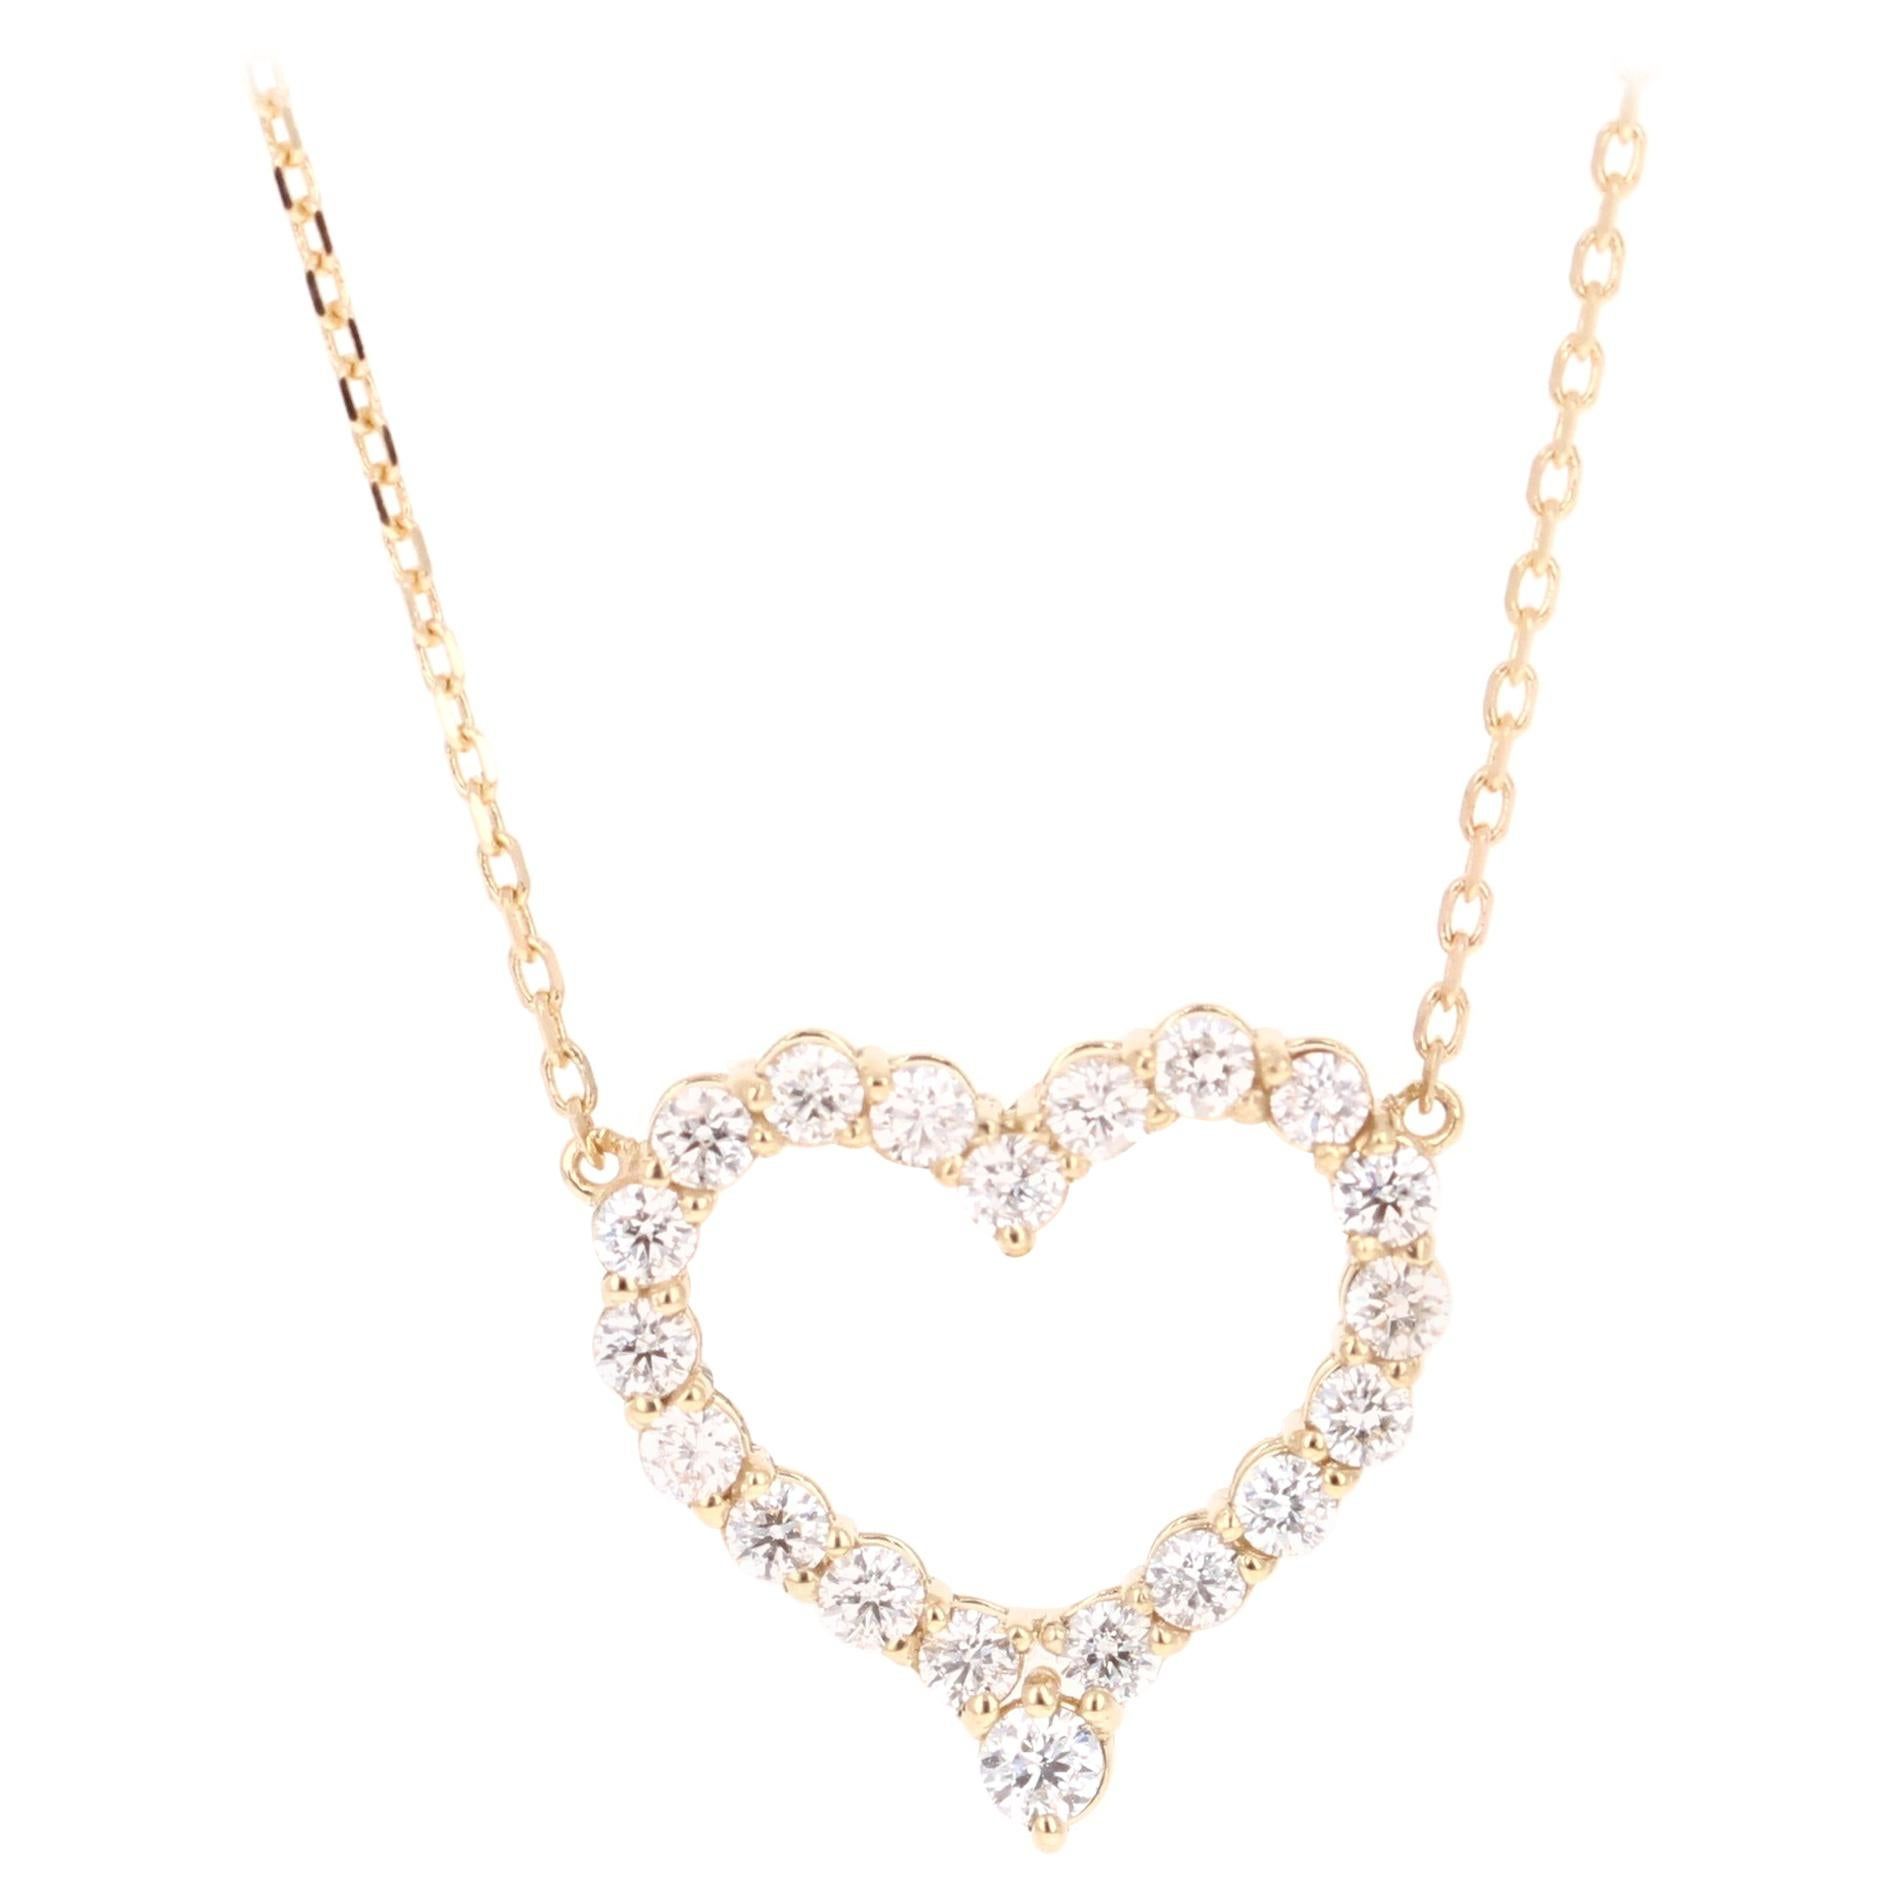 Diamond Heart Pendant 14 Karat Yellow Gold Chain Necklace